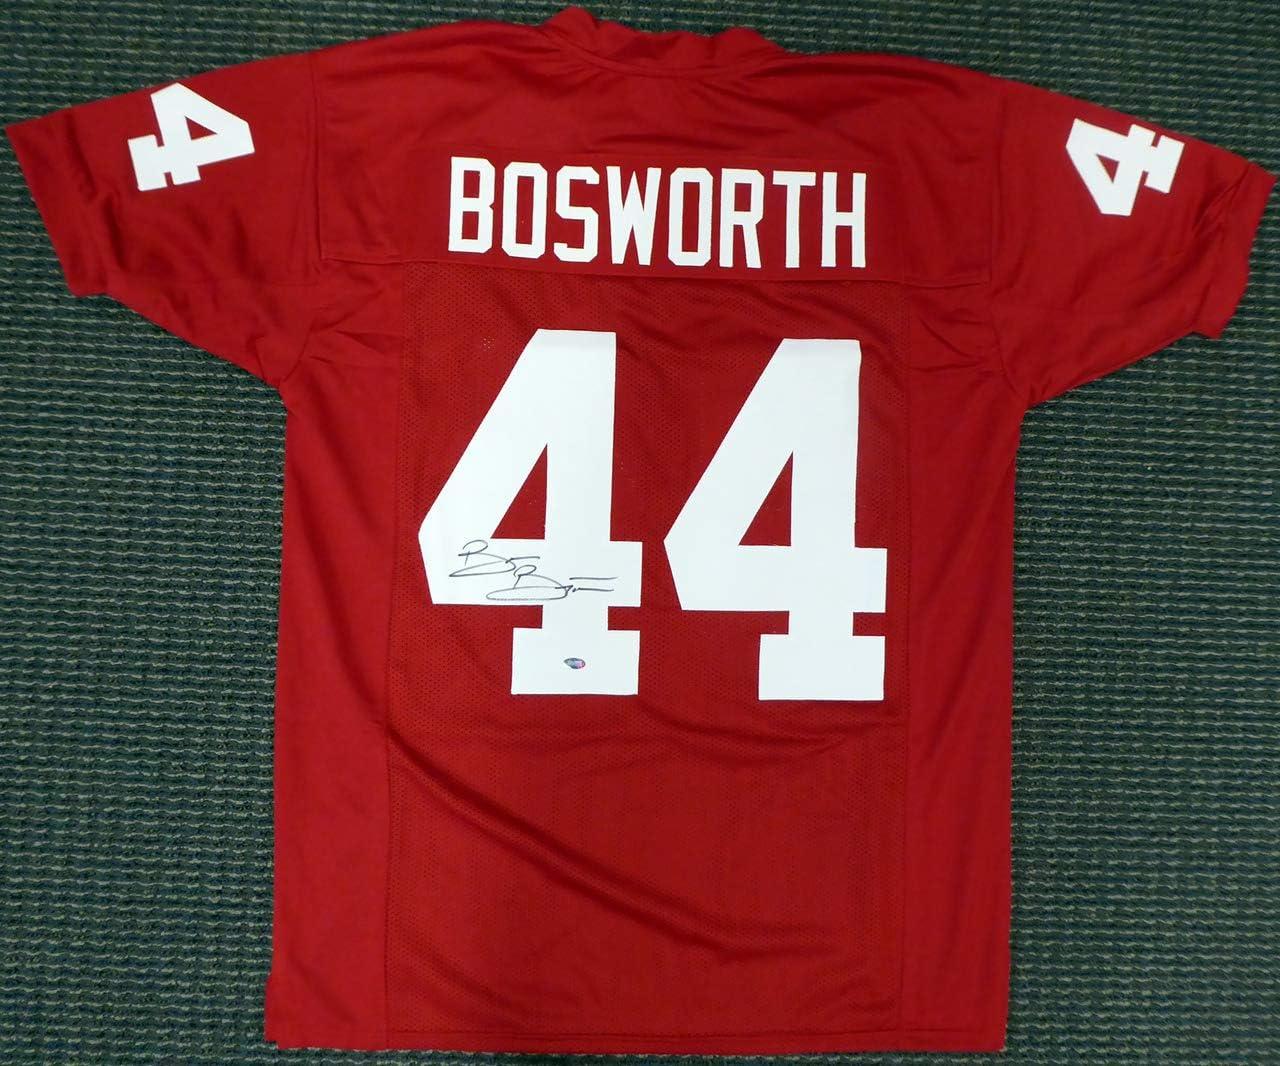 Brian Bosworth Oklahoma Sooners Jordan Football Jersey - White